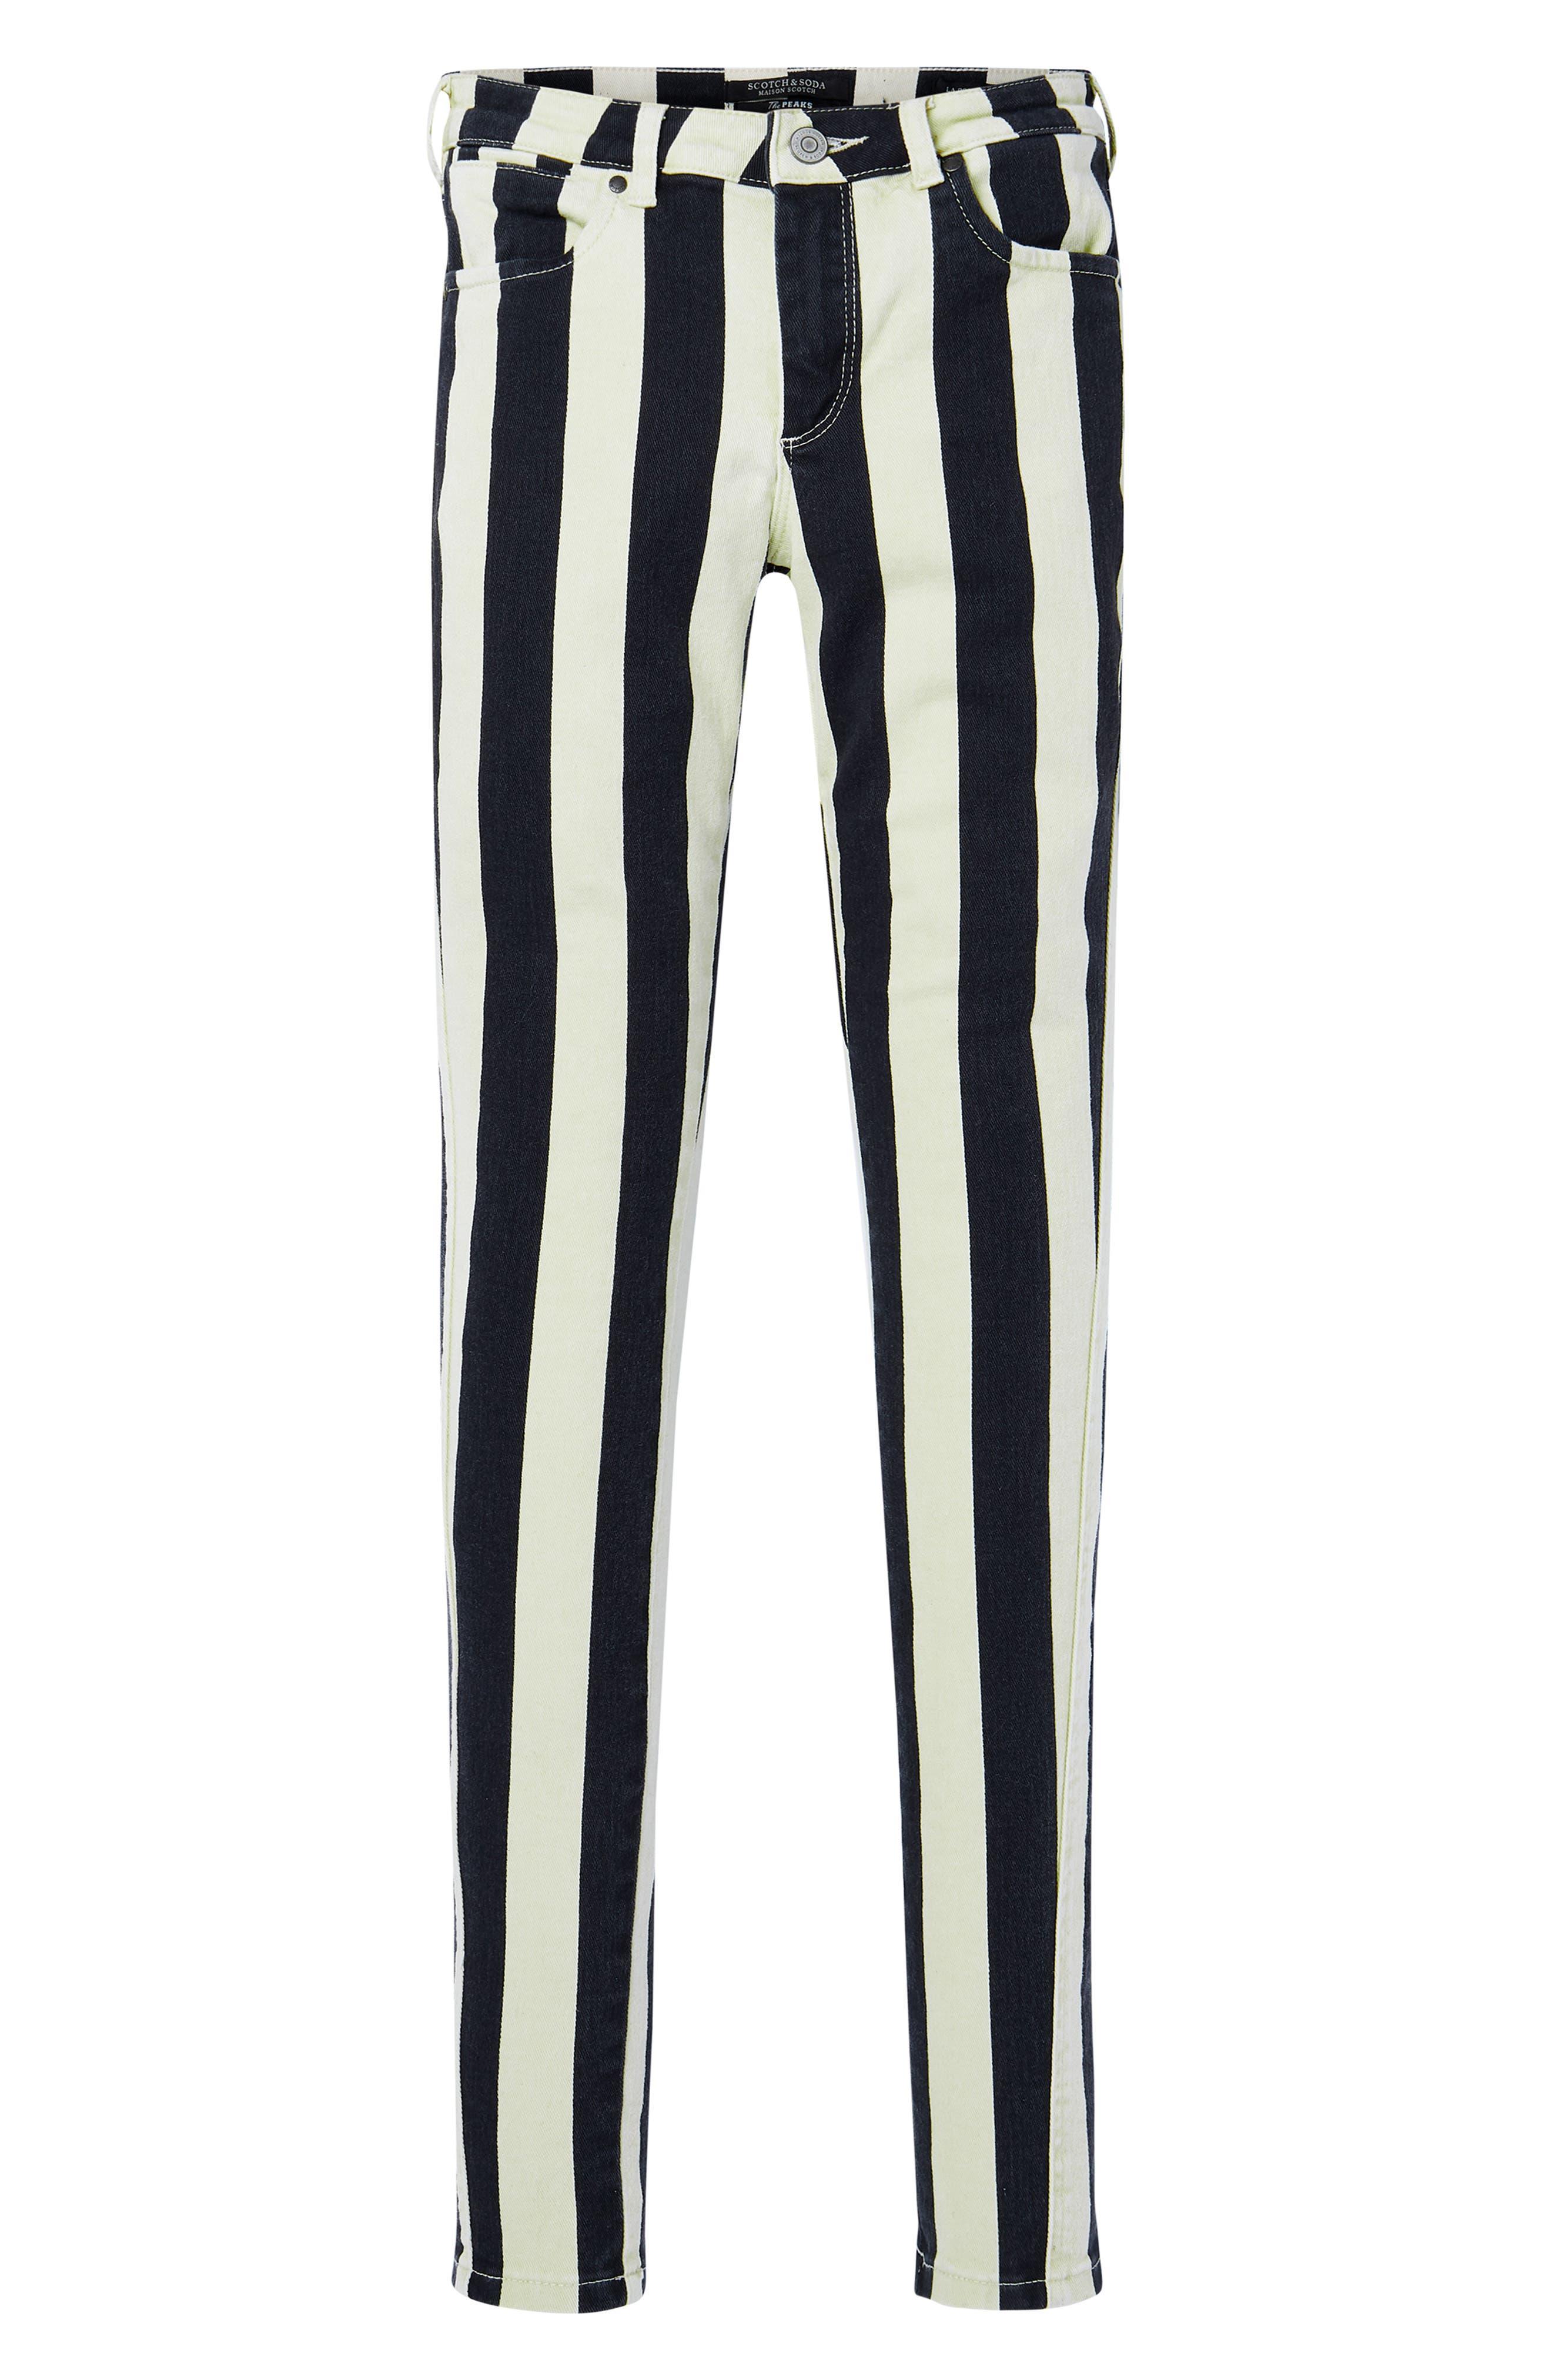 La Bohemienne Skinny Fit Pants,                             Alternate thumbnail 4, color,                             400